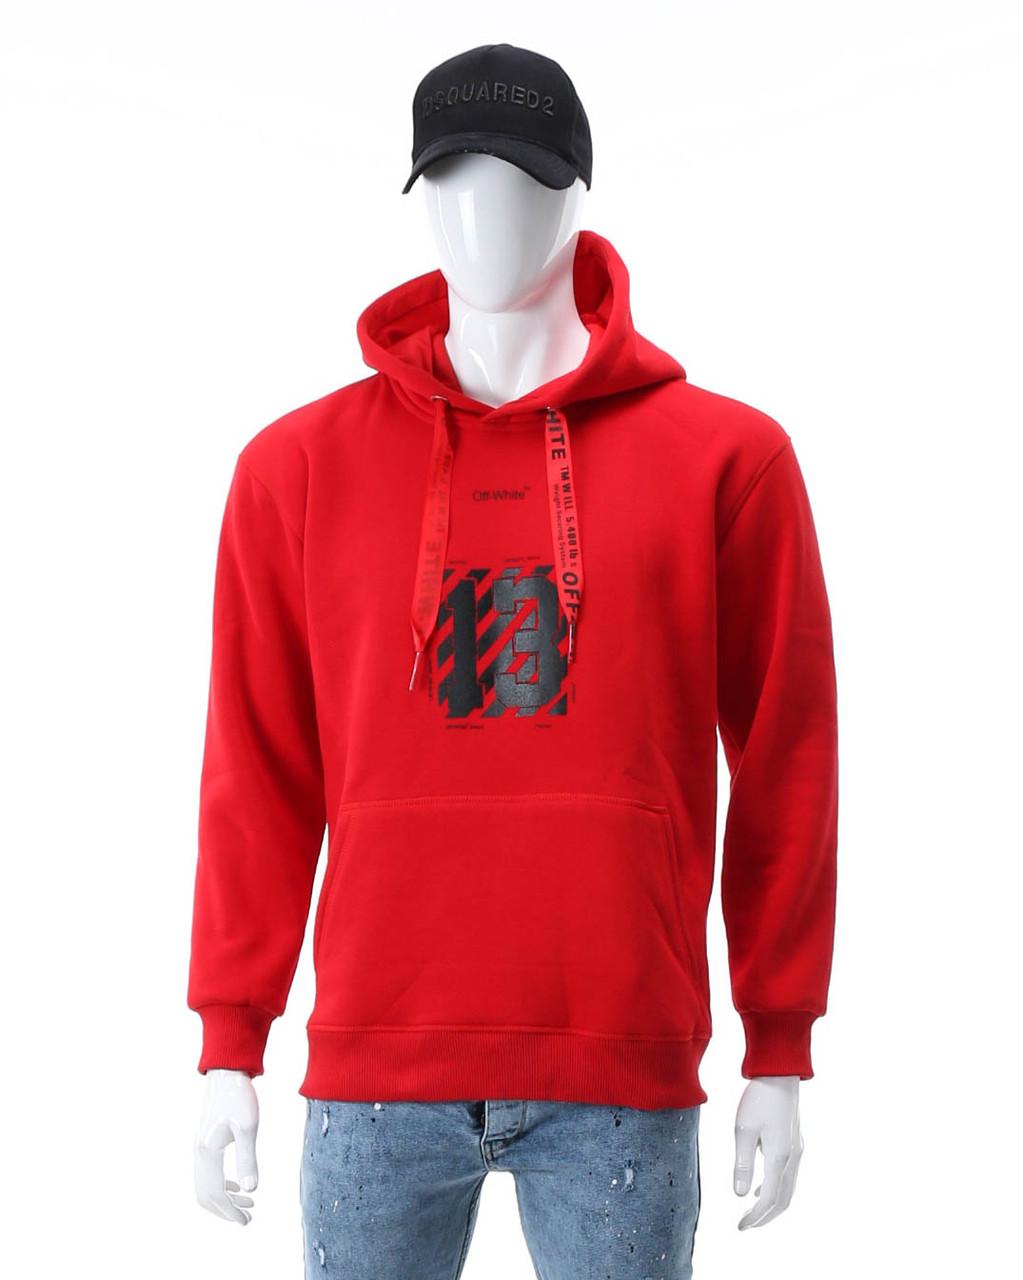 Худи осень-зима красный OFF-WHITE №13 Т-2 RED XL(Р) 19-581-203